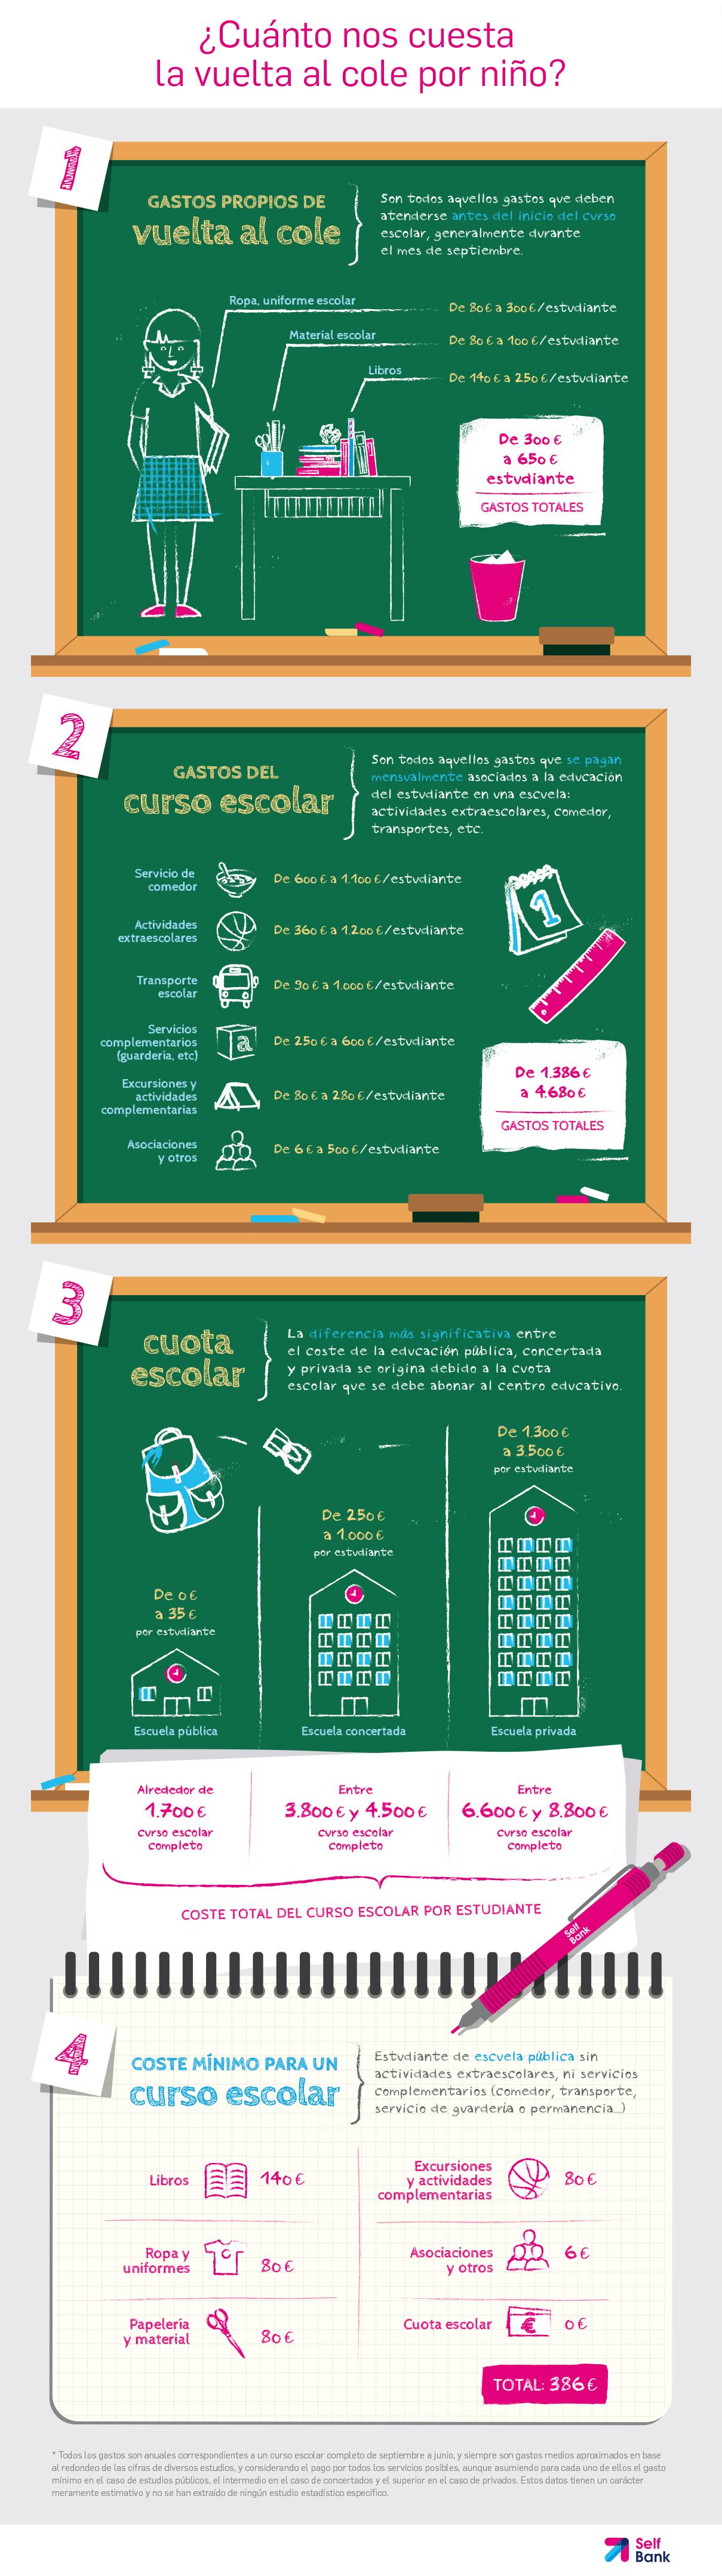 Infografía Selfbank vuelta al cole (1)